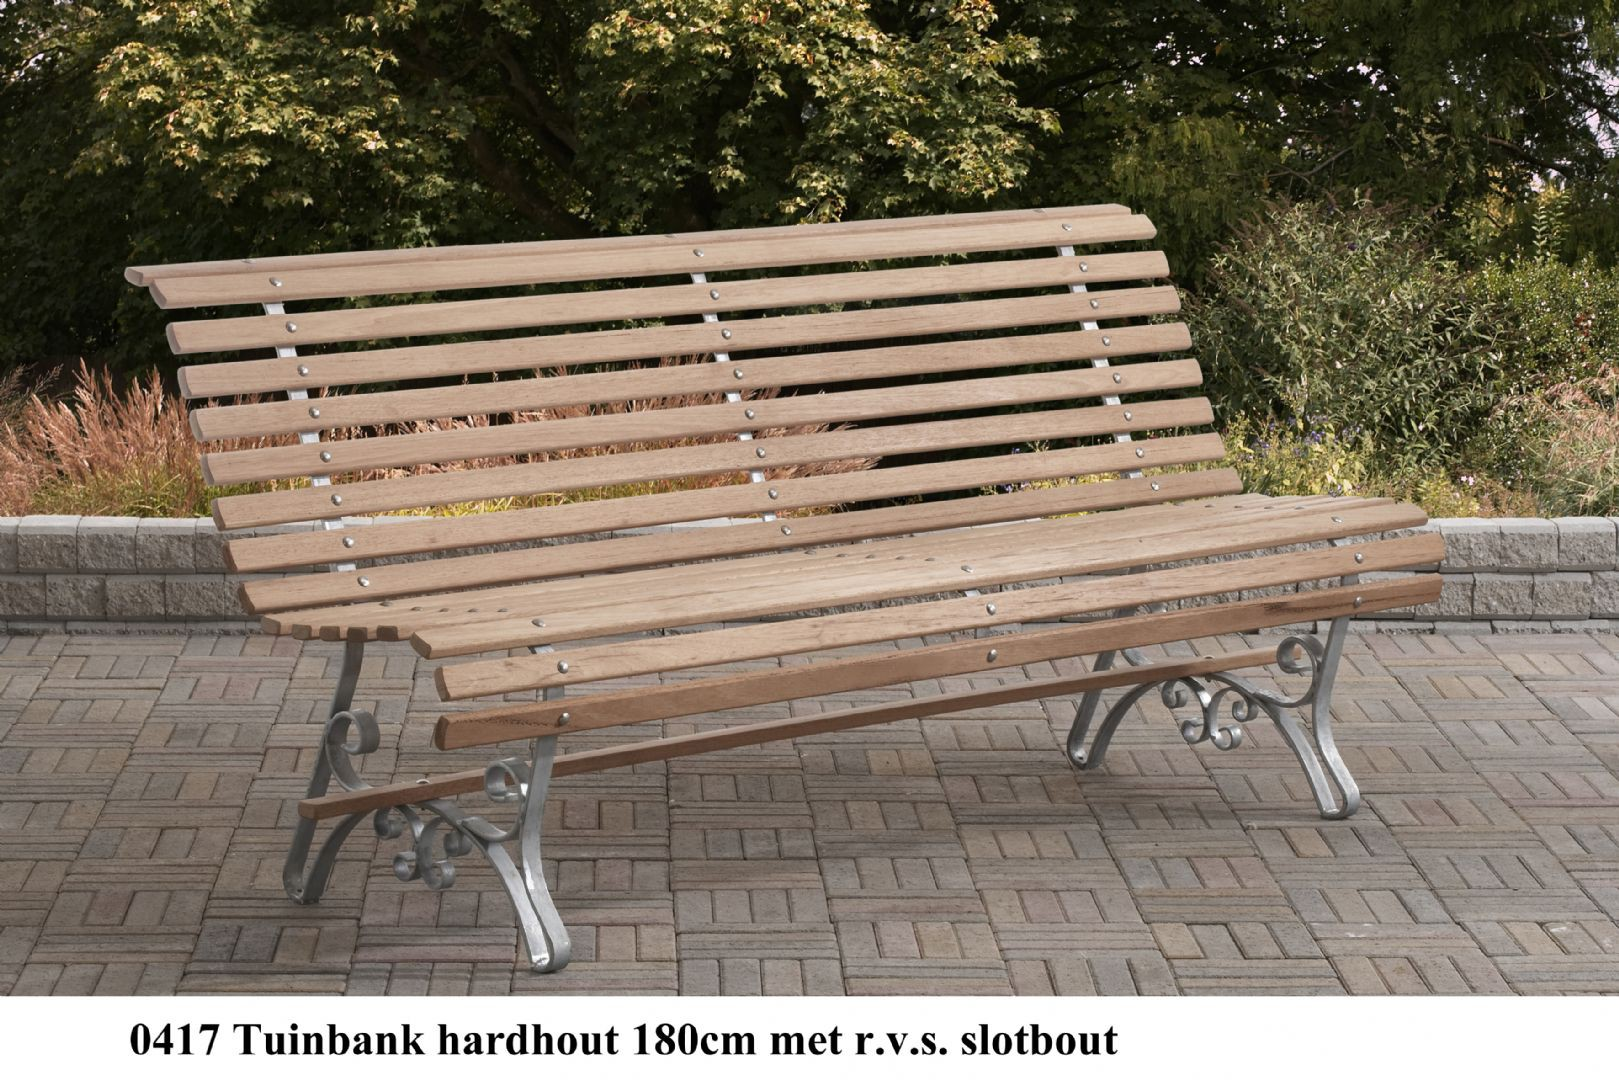 Beste Tuinbank hardhout (Jatoba)180 cm met r.v.s slotbouten WF-26